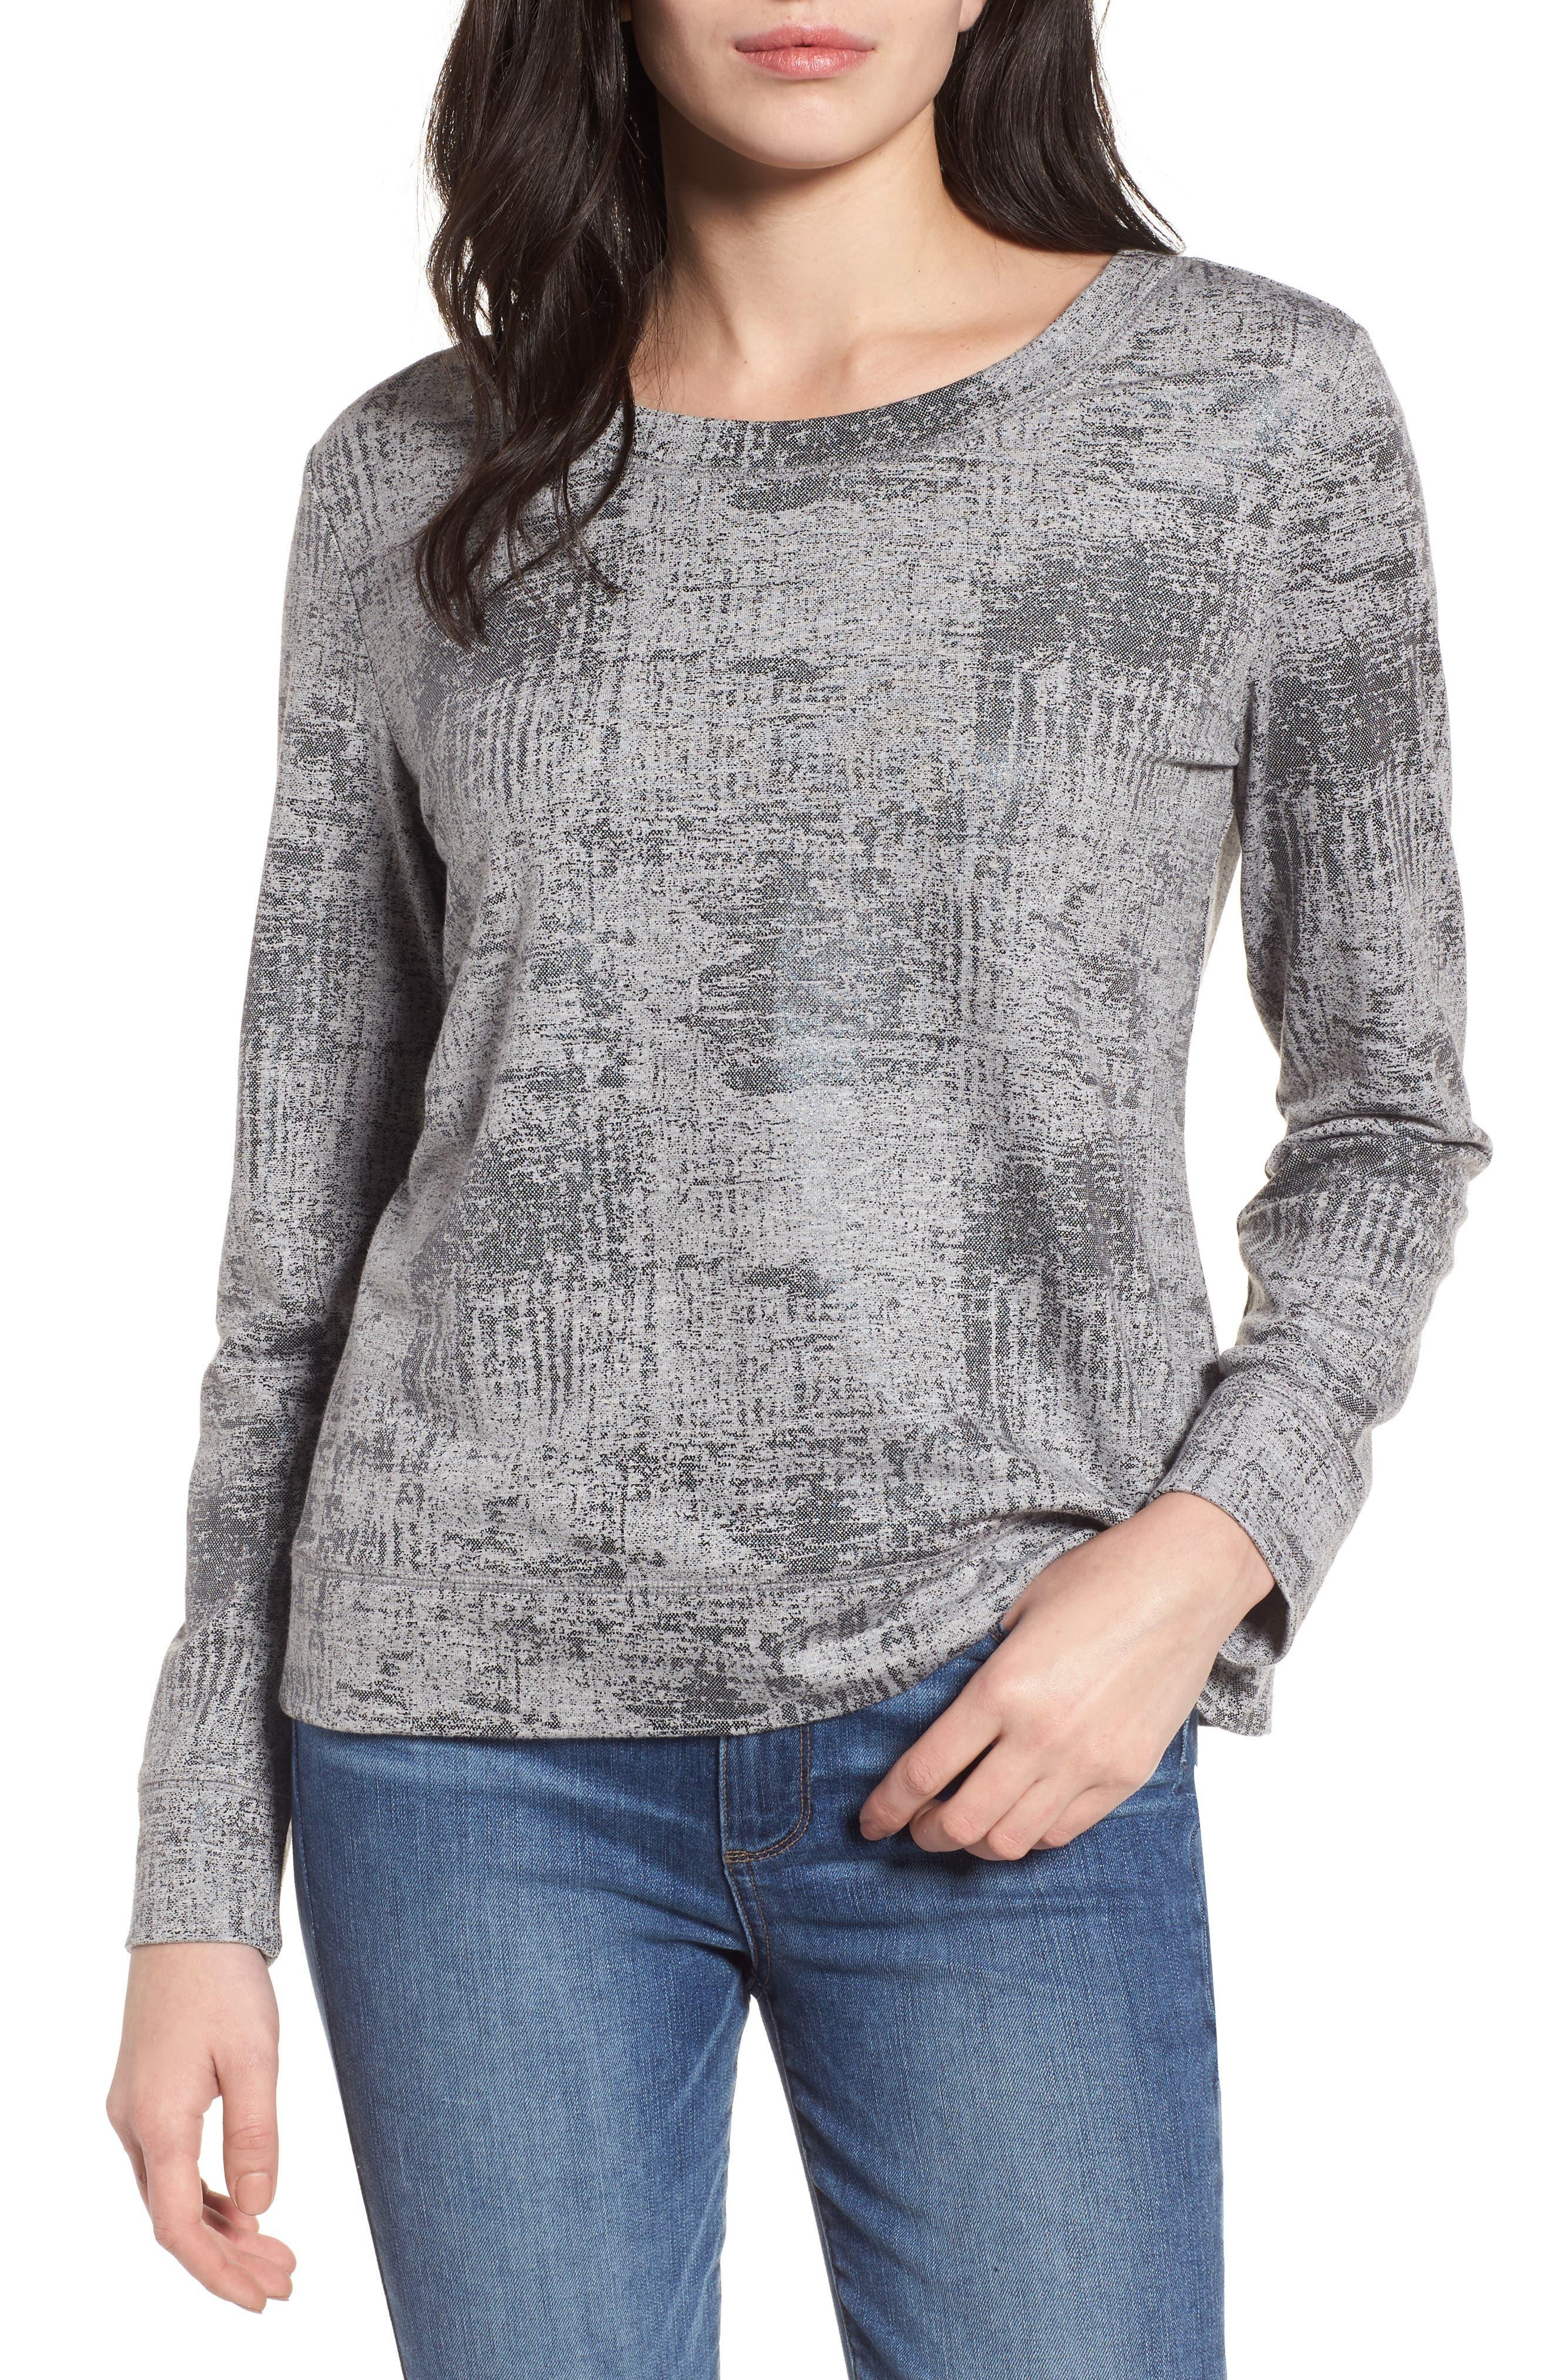 Alternate Image 1 Selected - Halogen® Foiled Sweatshirt